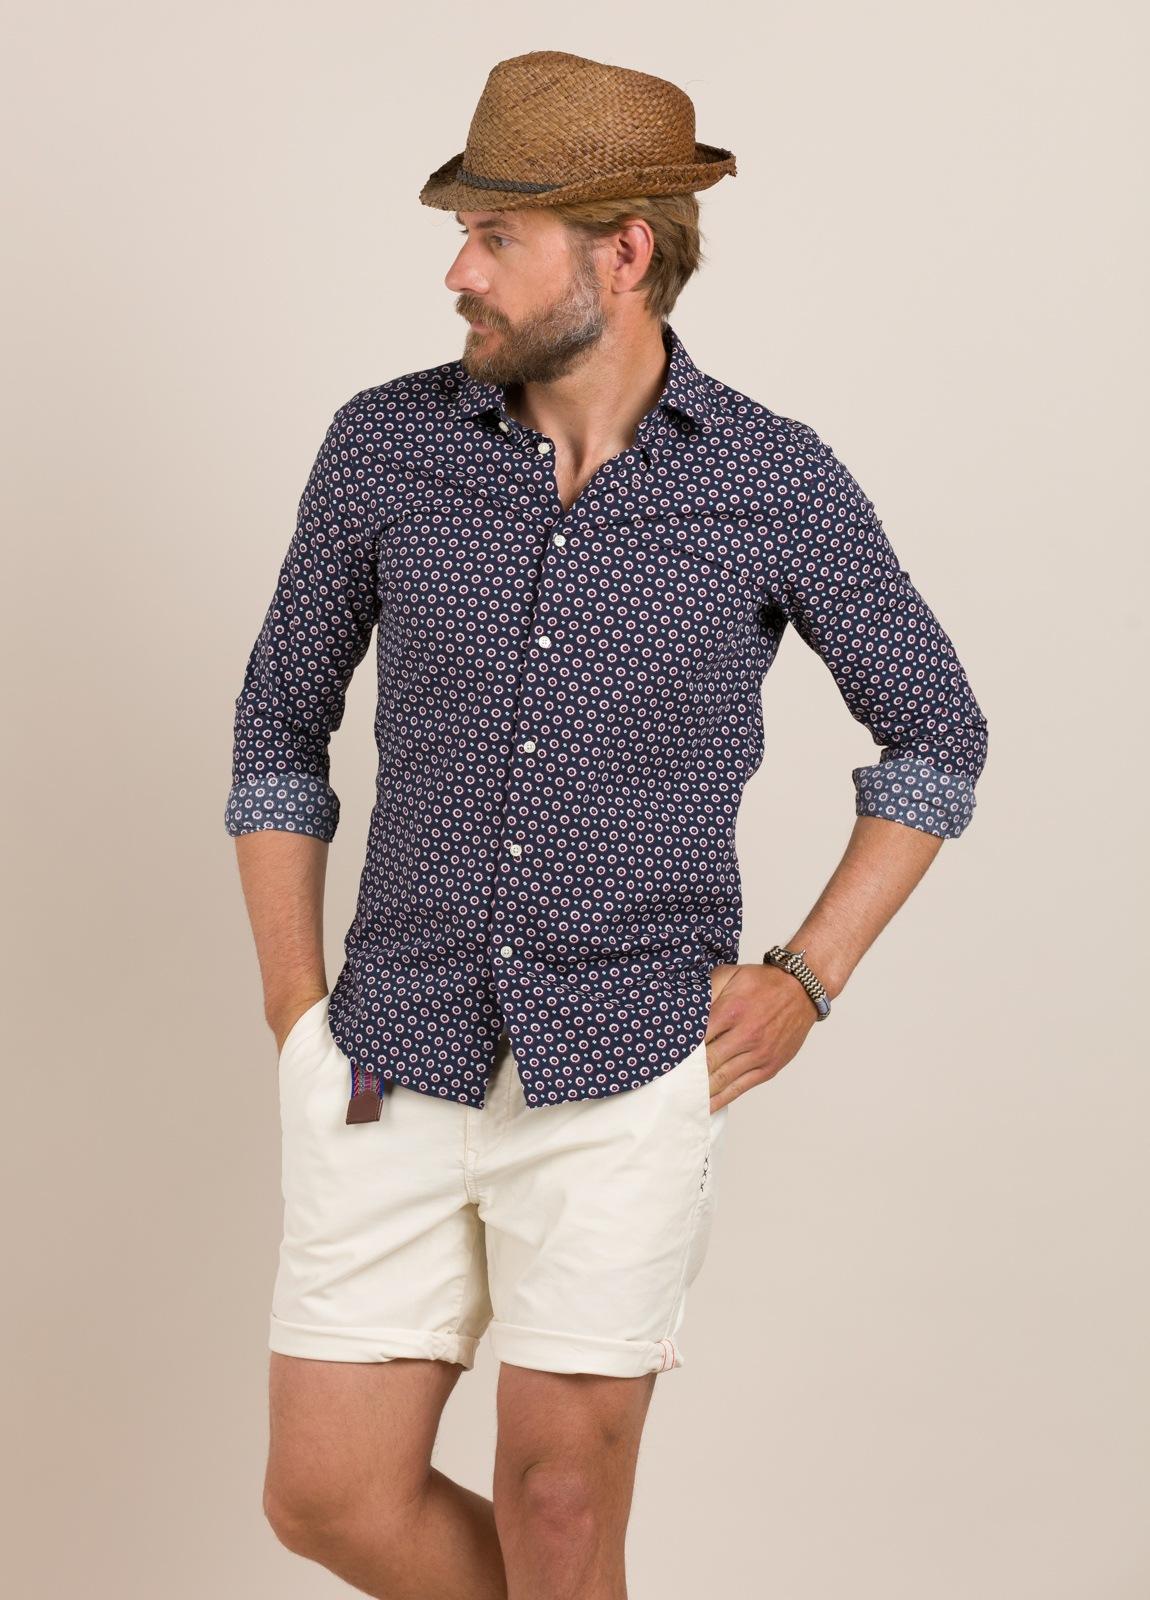 Camisa Casual Wear FUREST COLECCIÓN slim fit dibujo geométrico